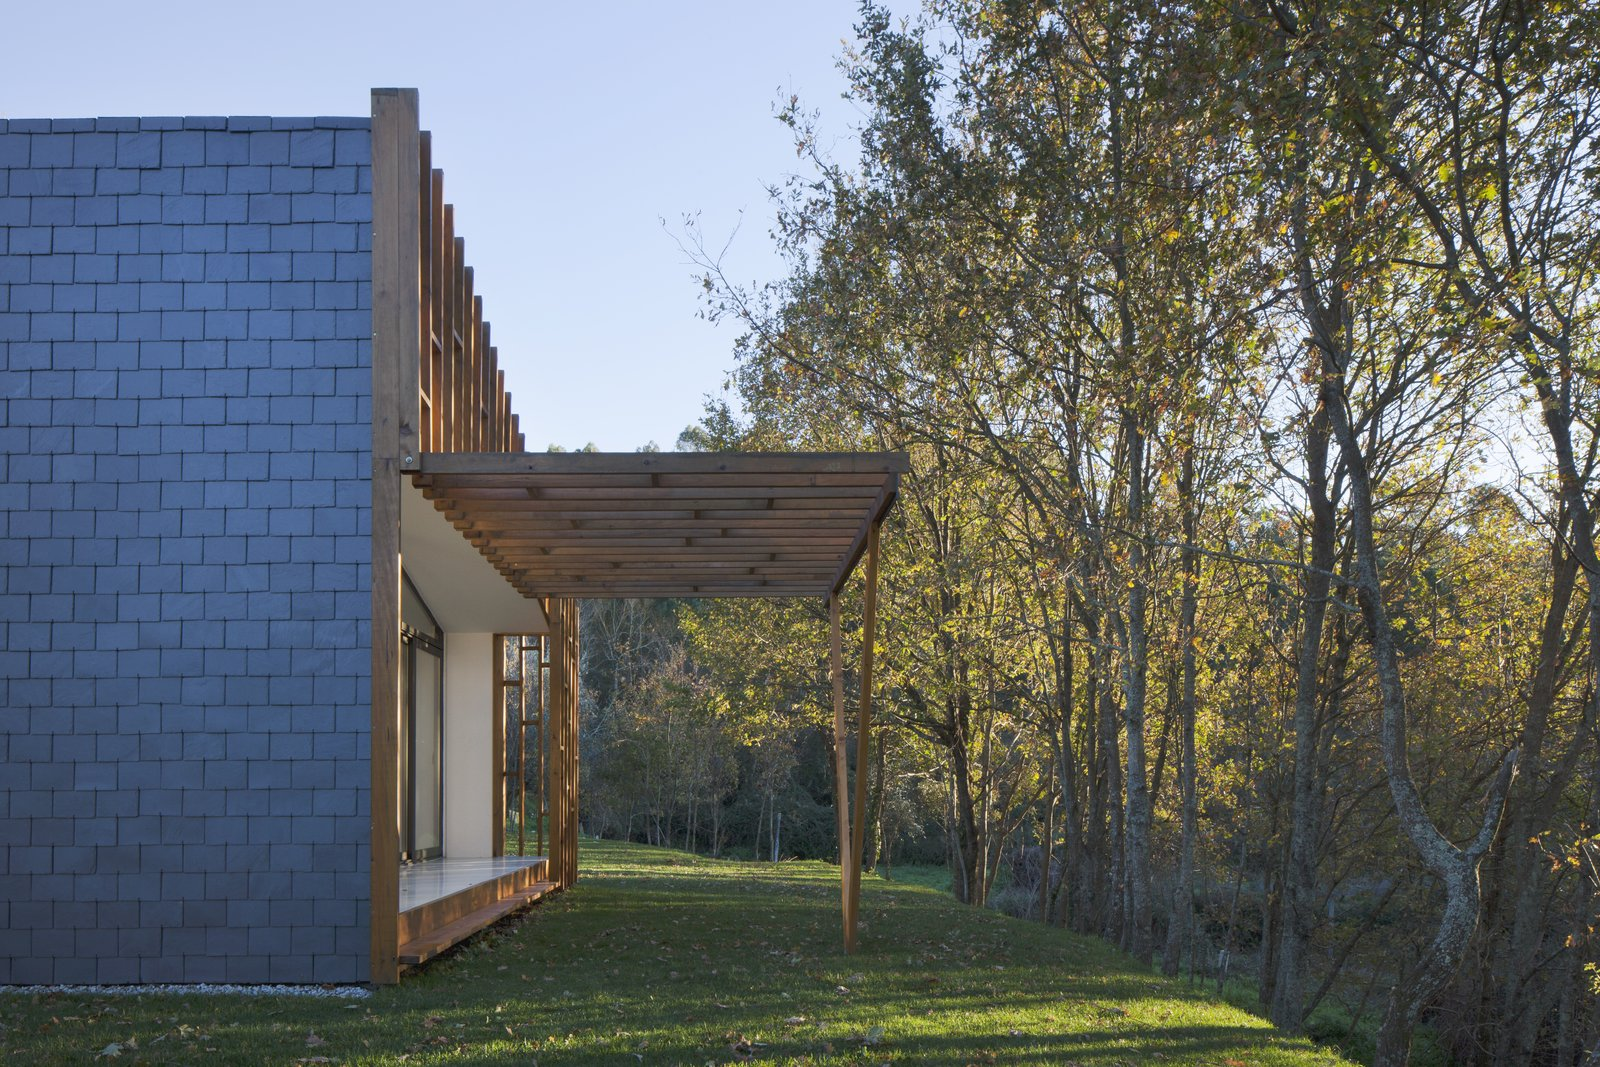 Outdoor, Back Yard, Garden, Trees, Woodland, Grass, Wood Patio, Porch, Deck, Concrete Patio, Porch, Deck, Shrubs, and Stone Patio, Porch, Deck Backyard View  GOMOS #1